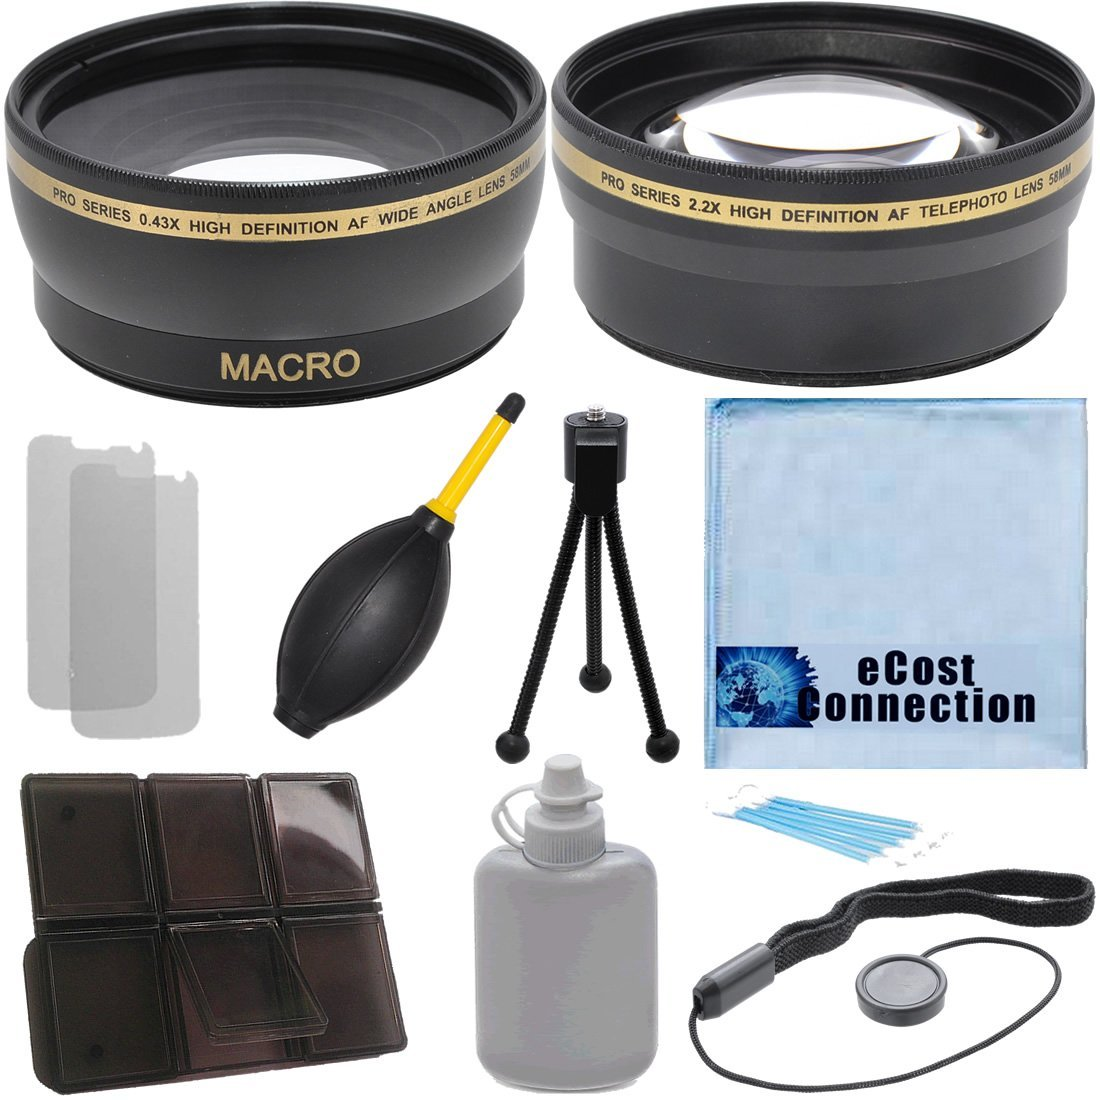 EF 70-300mm f//4-5.6L IS USM Lens EF-S 18-135mm f//3.5-5.6 IS Lens and More Models Vivitar Pro Series 67mm 2.2x High Definition AF Telephoto Lens for Canon EF 100mm f//2.8L Macro IS USM Lens eCost Microfiber Cleaning C 18-135mm f//3.5-5.6 EF-S IS STM Lens